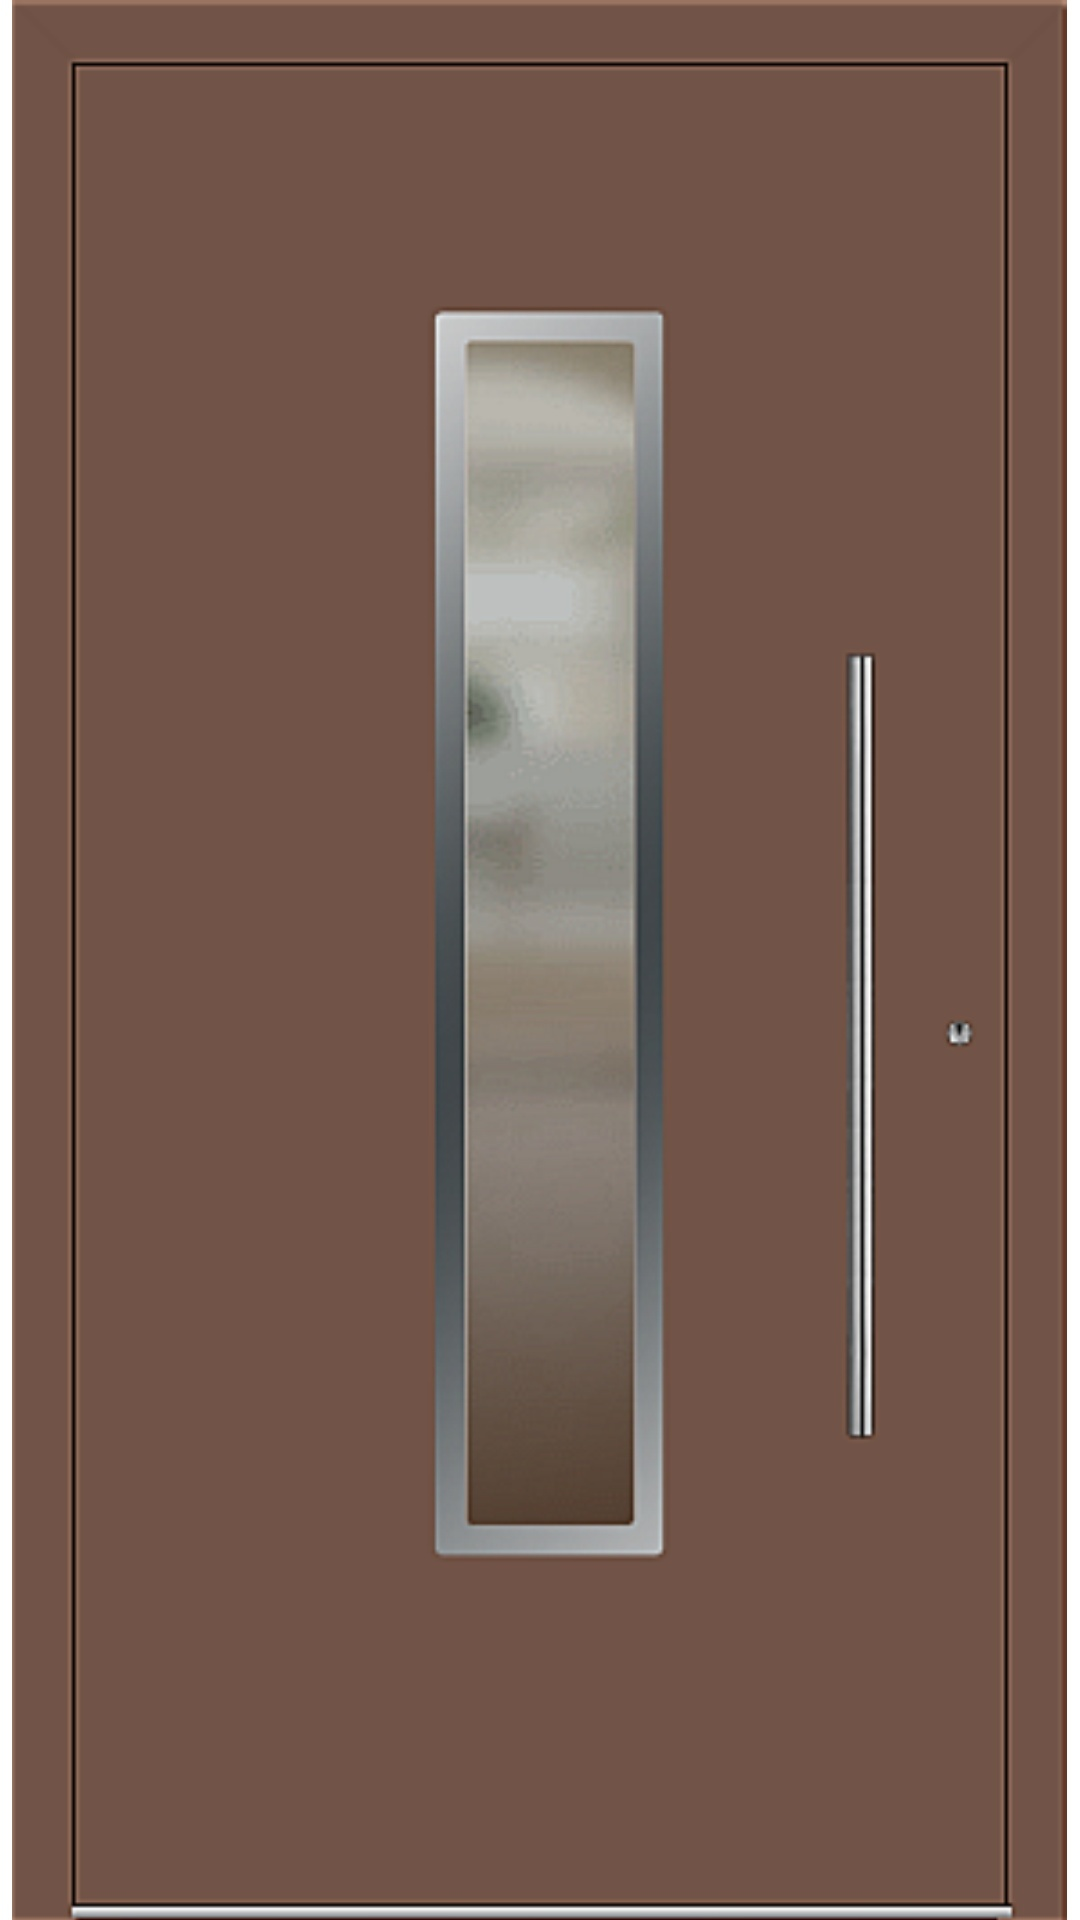 PaXentrée Aluminium Haustür M01211 lehmbraun